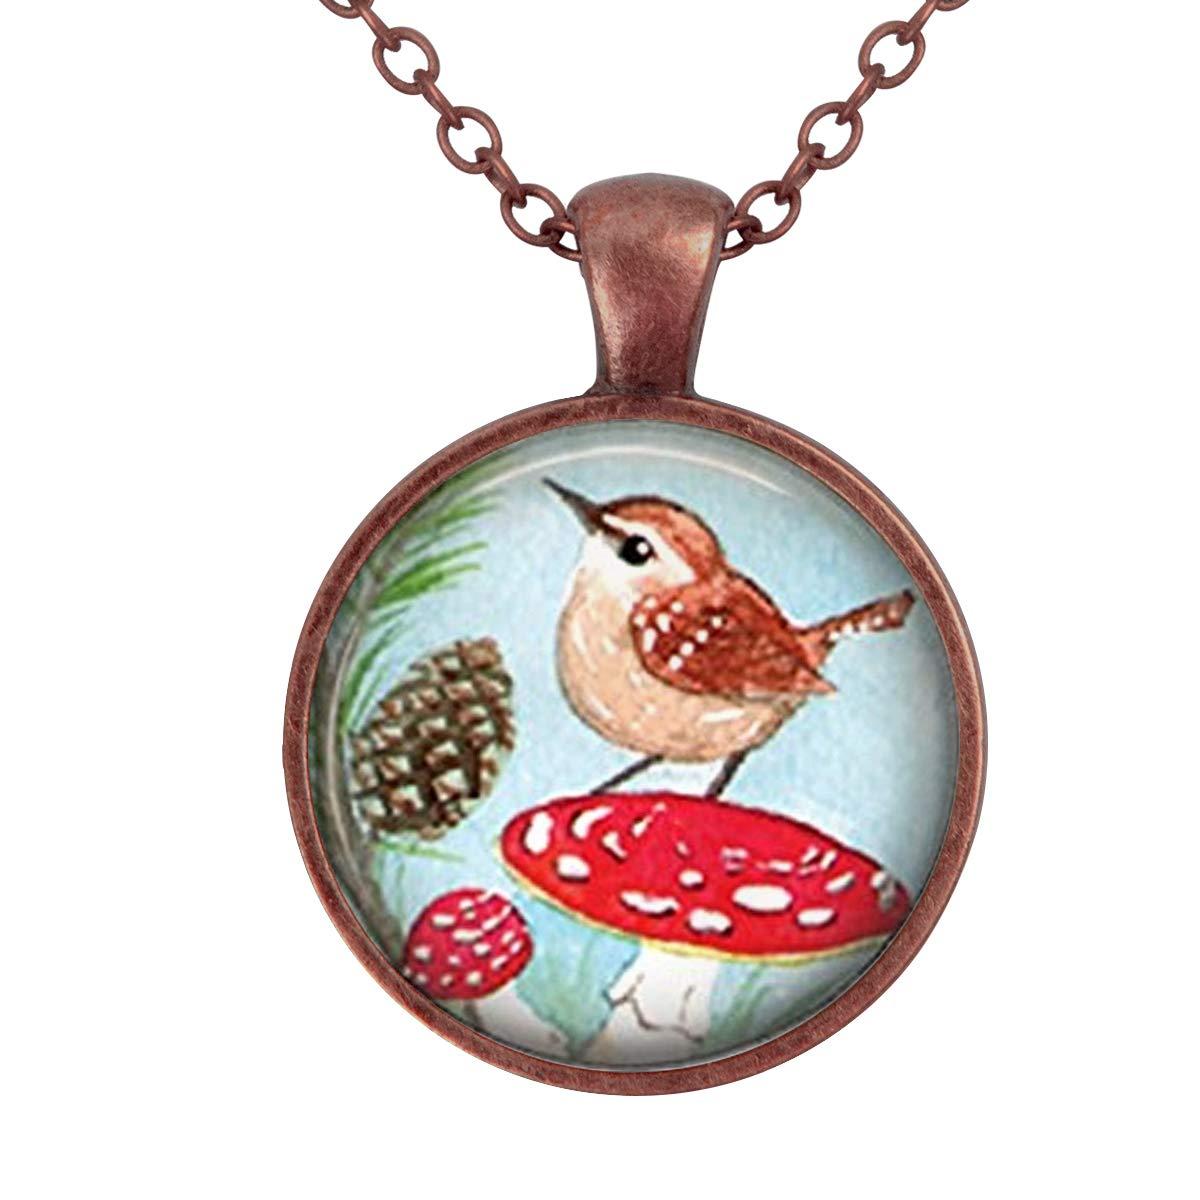 Lightrain Bird on Mushroom Art Pendant Necklace Vintage Bronze Chain Statement Necklace Handmade Jewelry Gifts